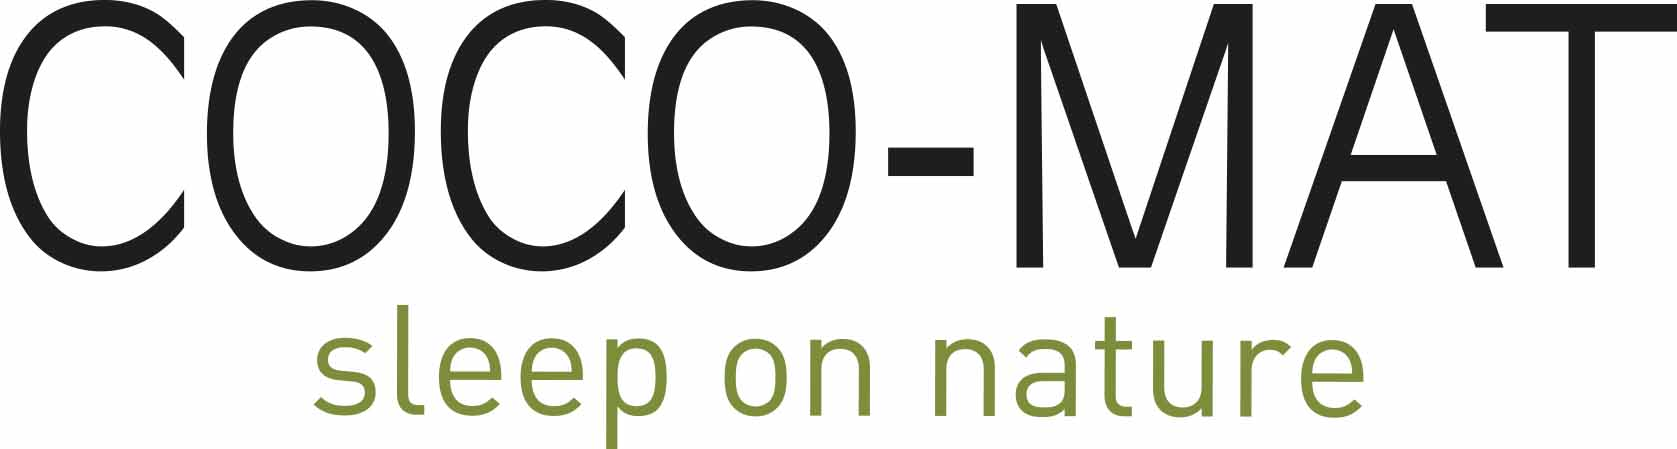 CocoMat_logo_print.jpg